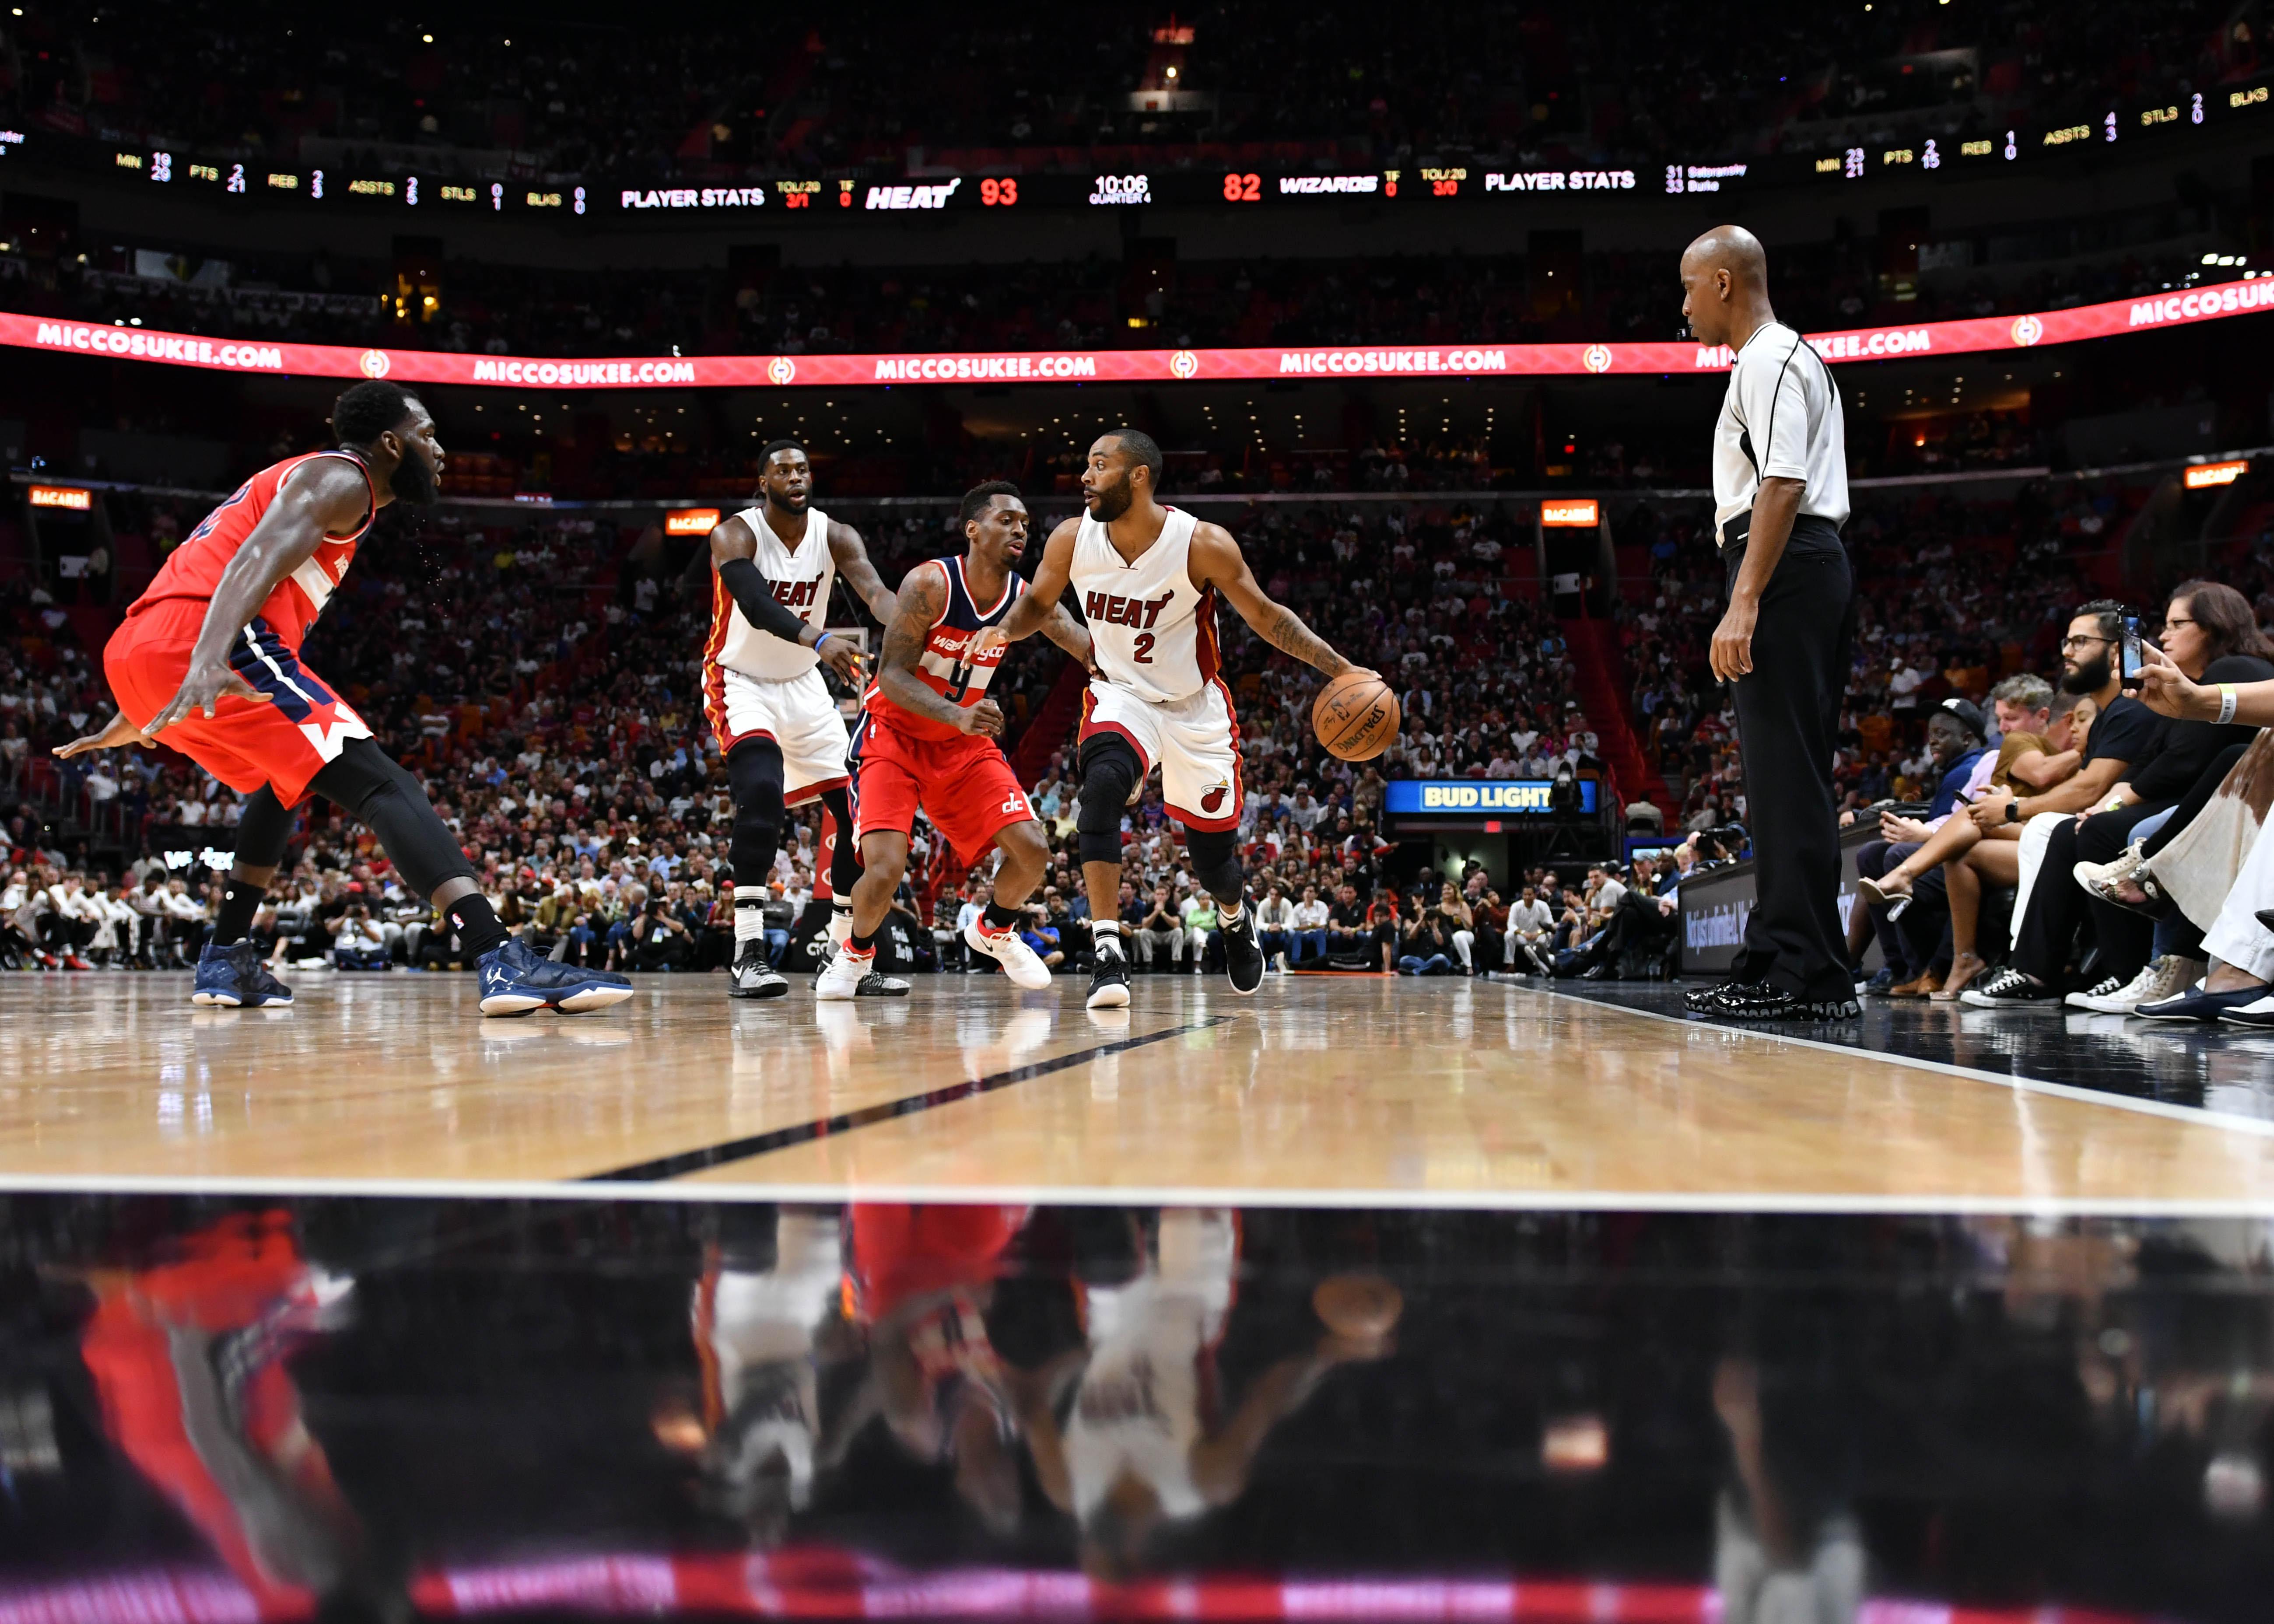 Bam Adebayo Will Make Florida His Bitch Today: New Nike Jersey For Miami Heat On Bam Adebayo's NBA2K18